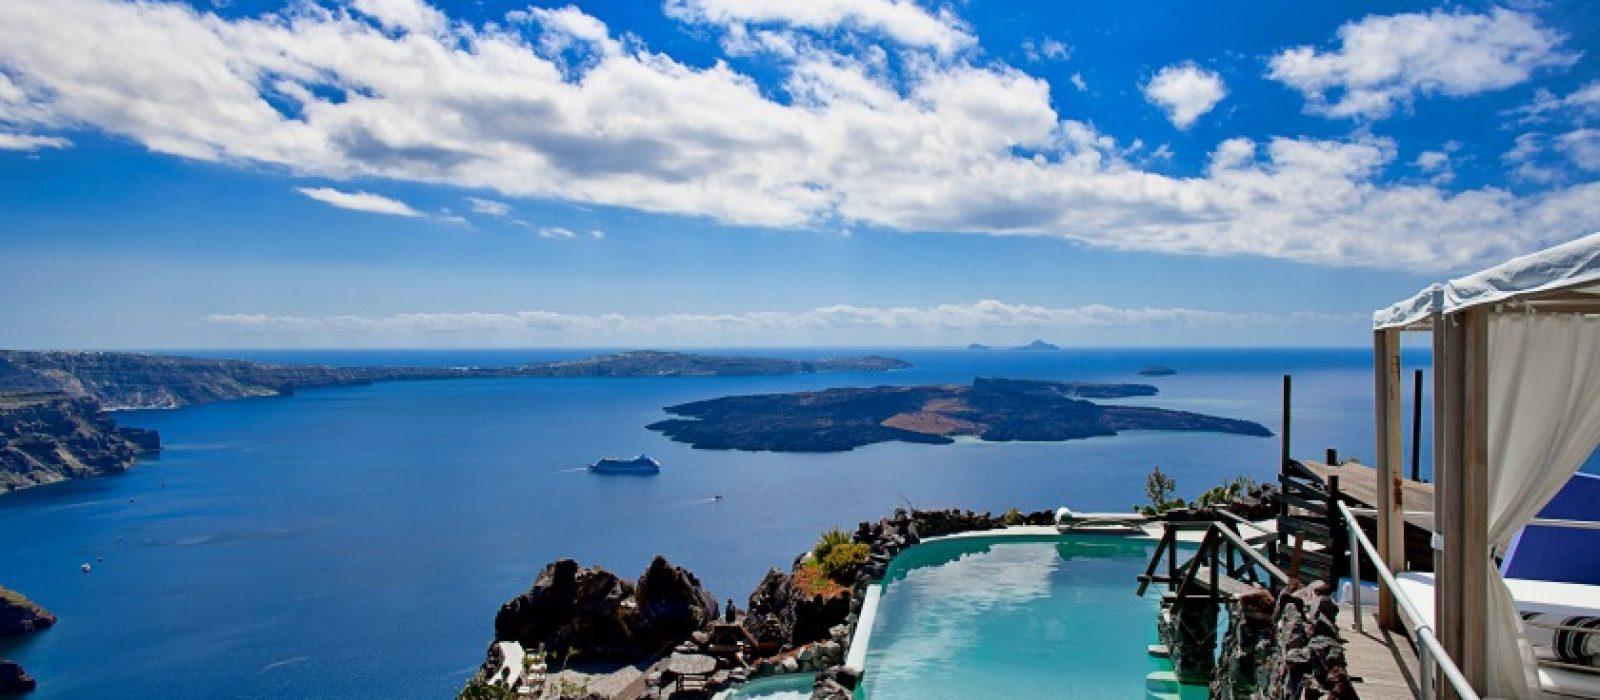 Povratak na Santorini, osmi deo